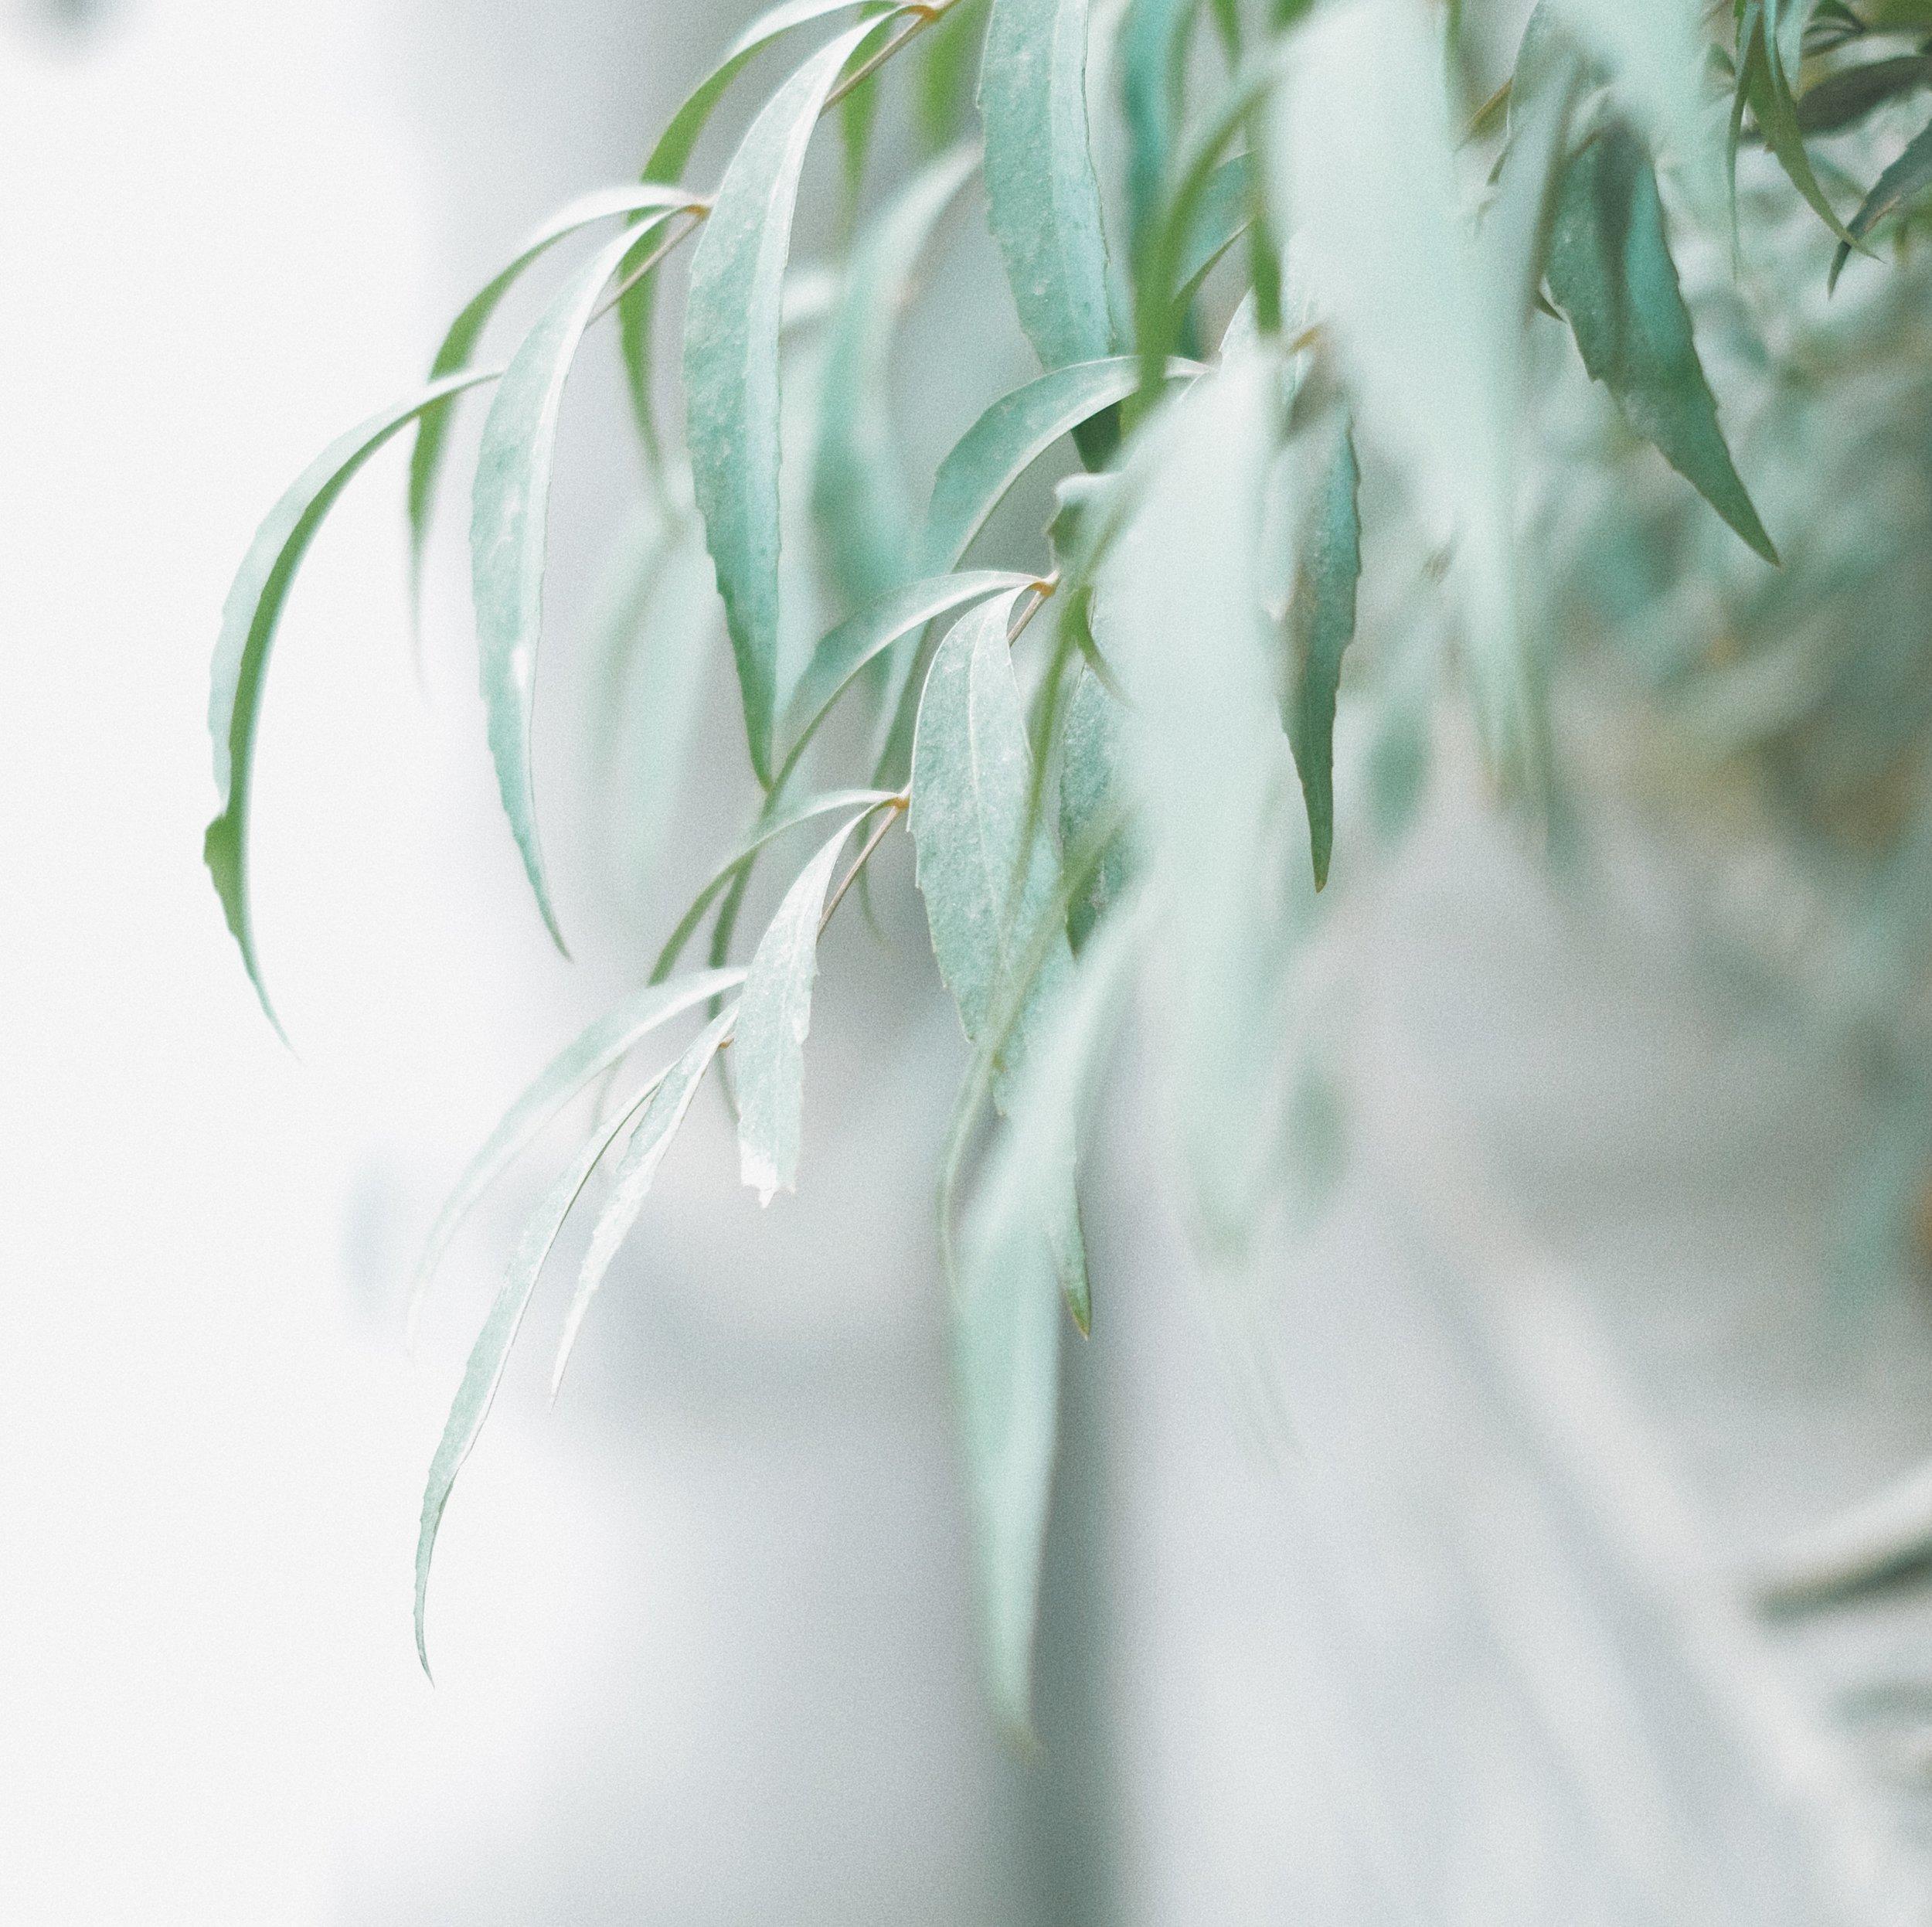 Wild Willow tree